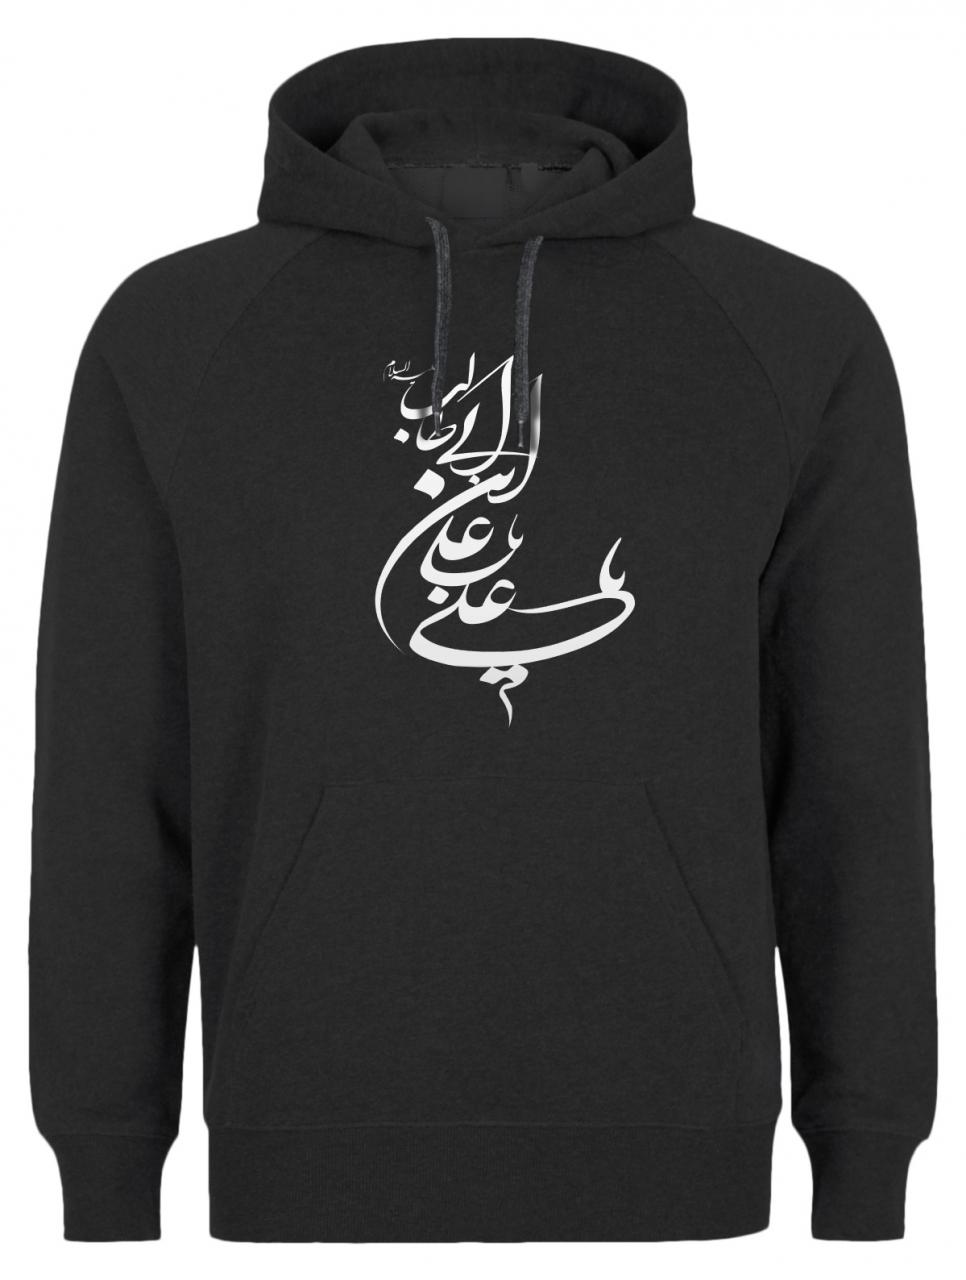 Ya Ali ibn abi Talib Schia Ashura Herren Hoodie